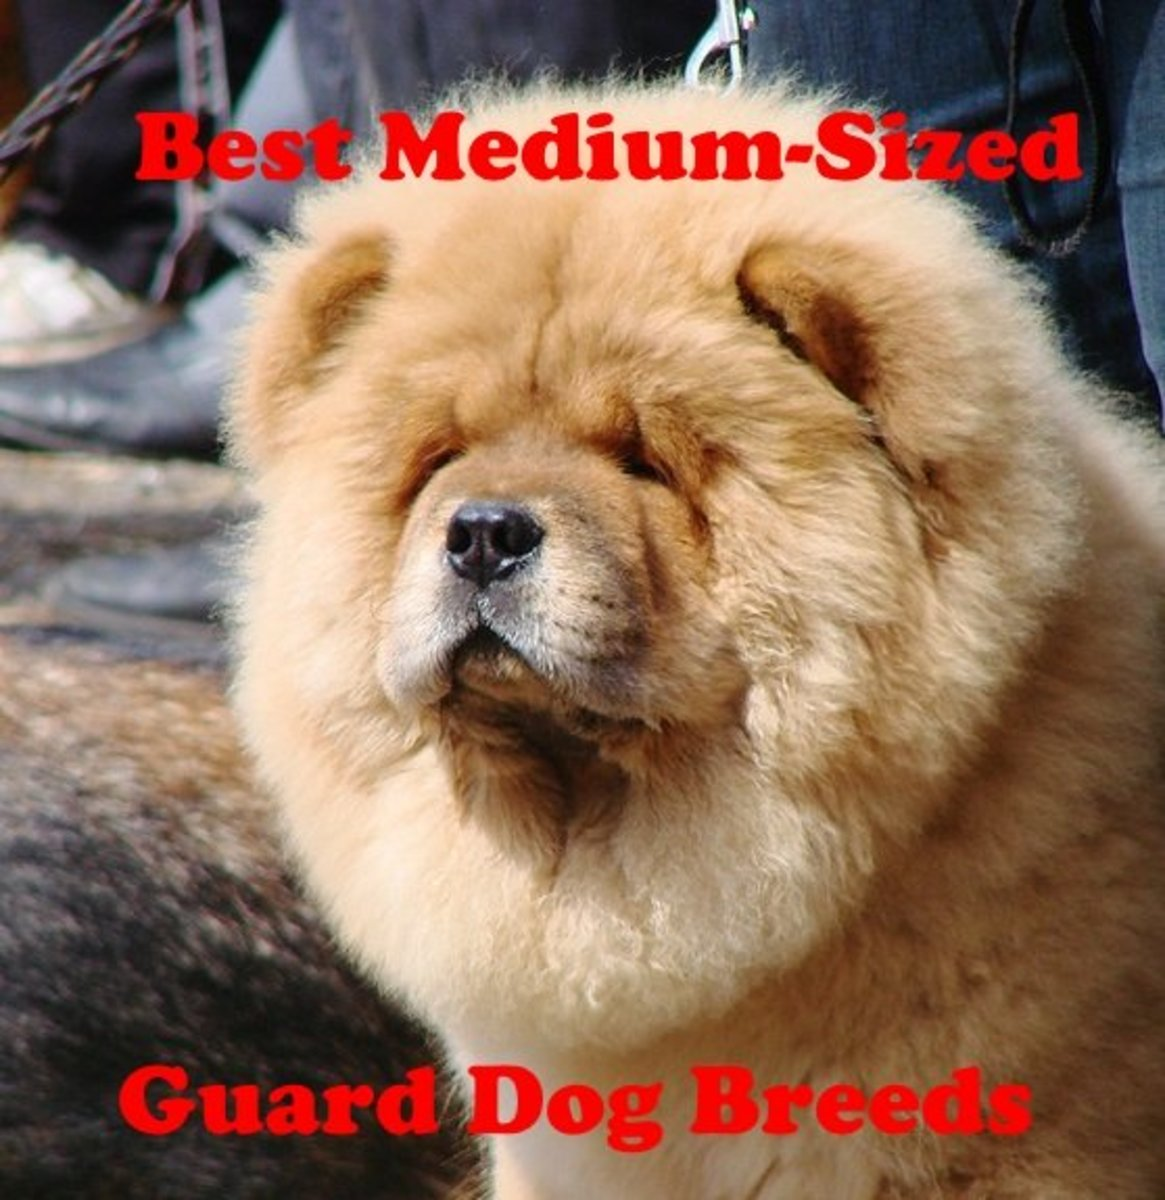 Best Medium-Sized Guard Dog Breeds